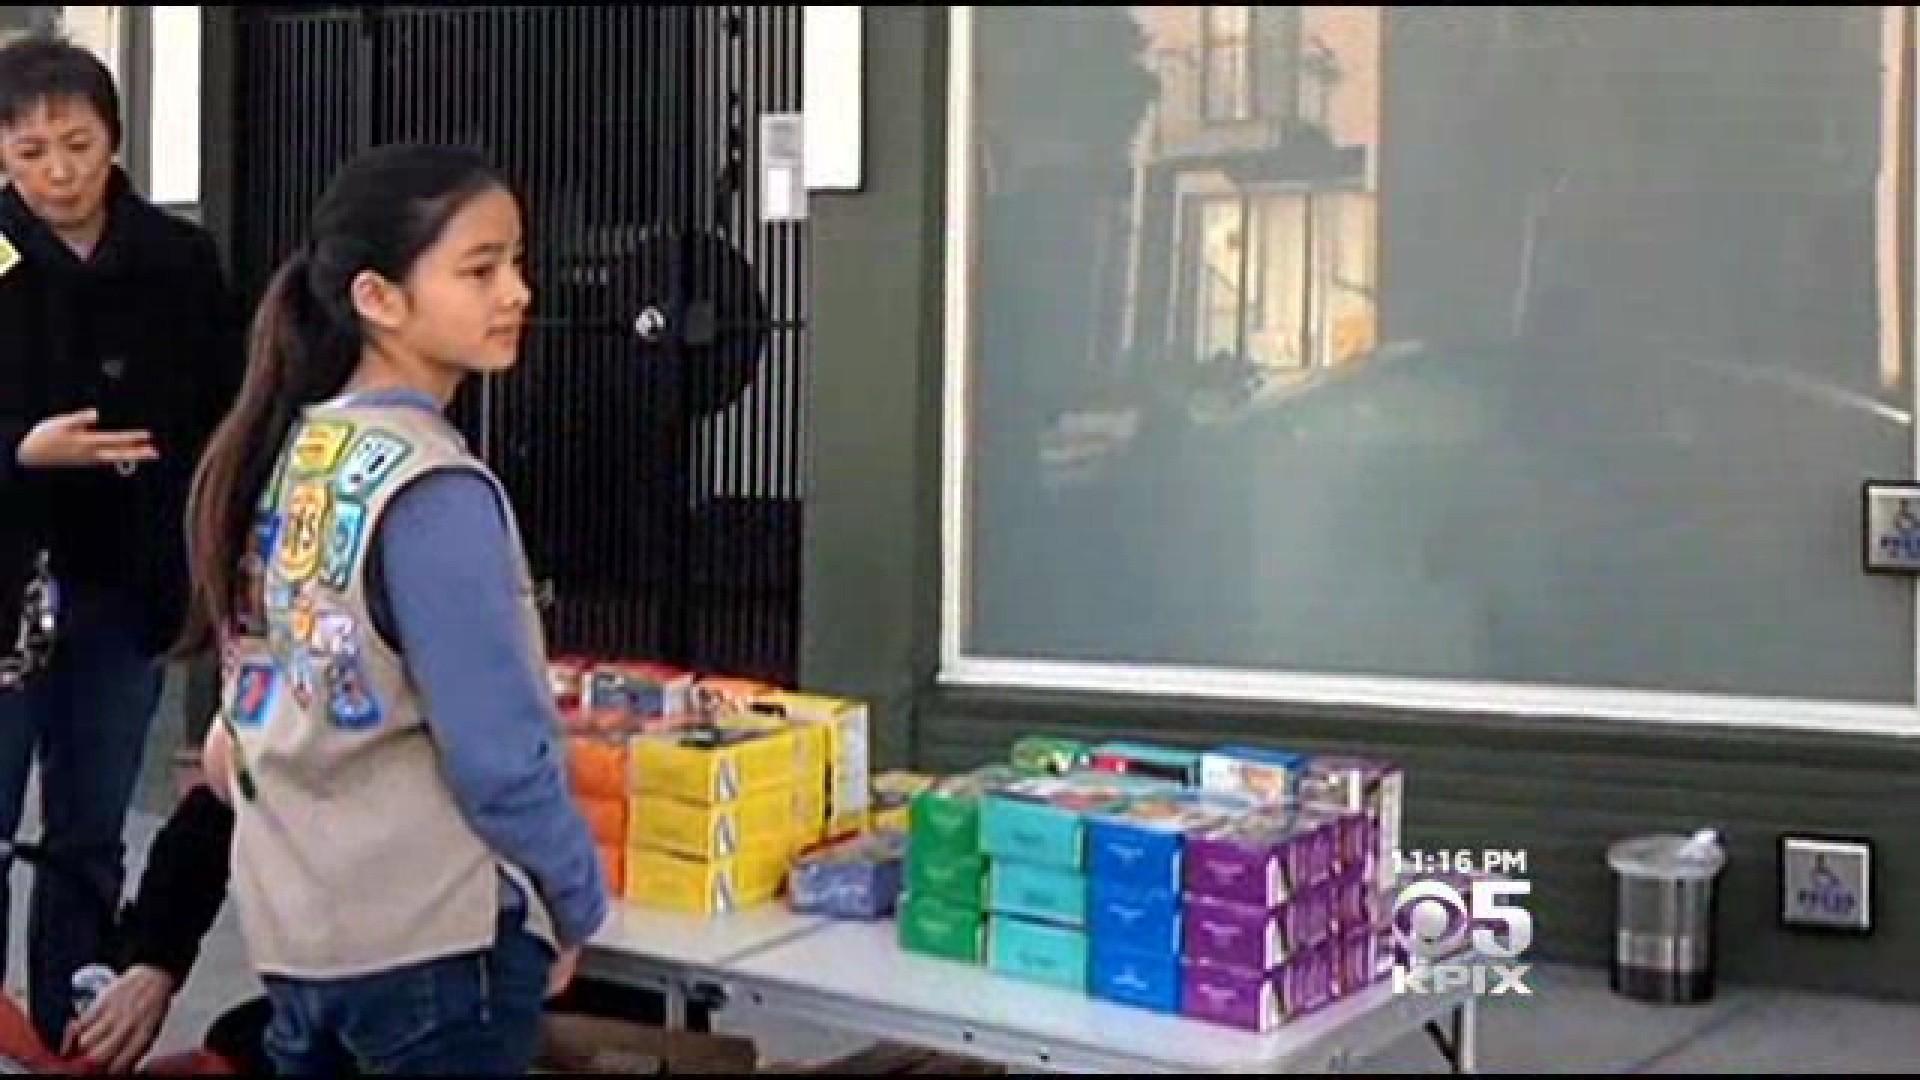 Bay Area Girl Scout sells cookies outside marijuana